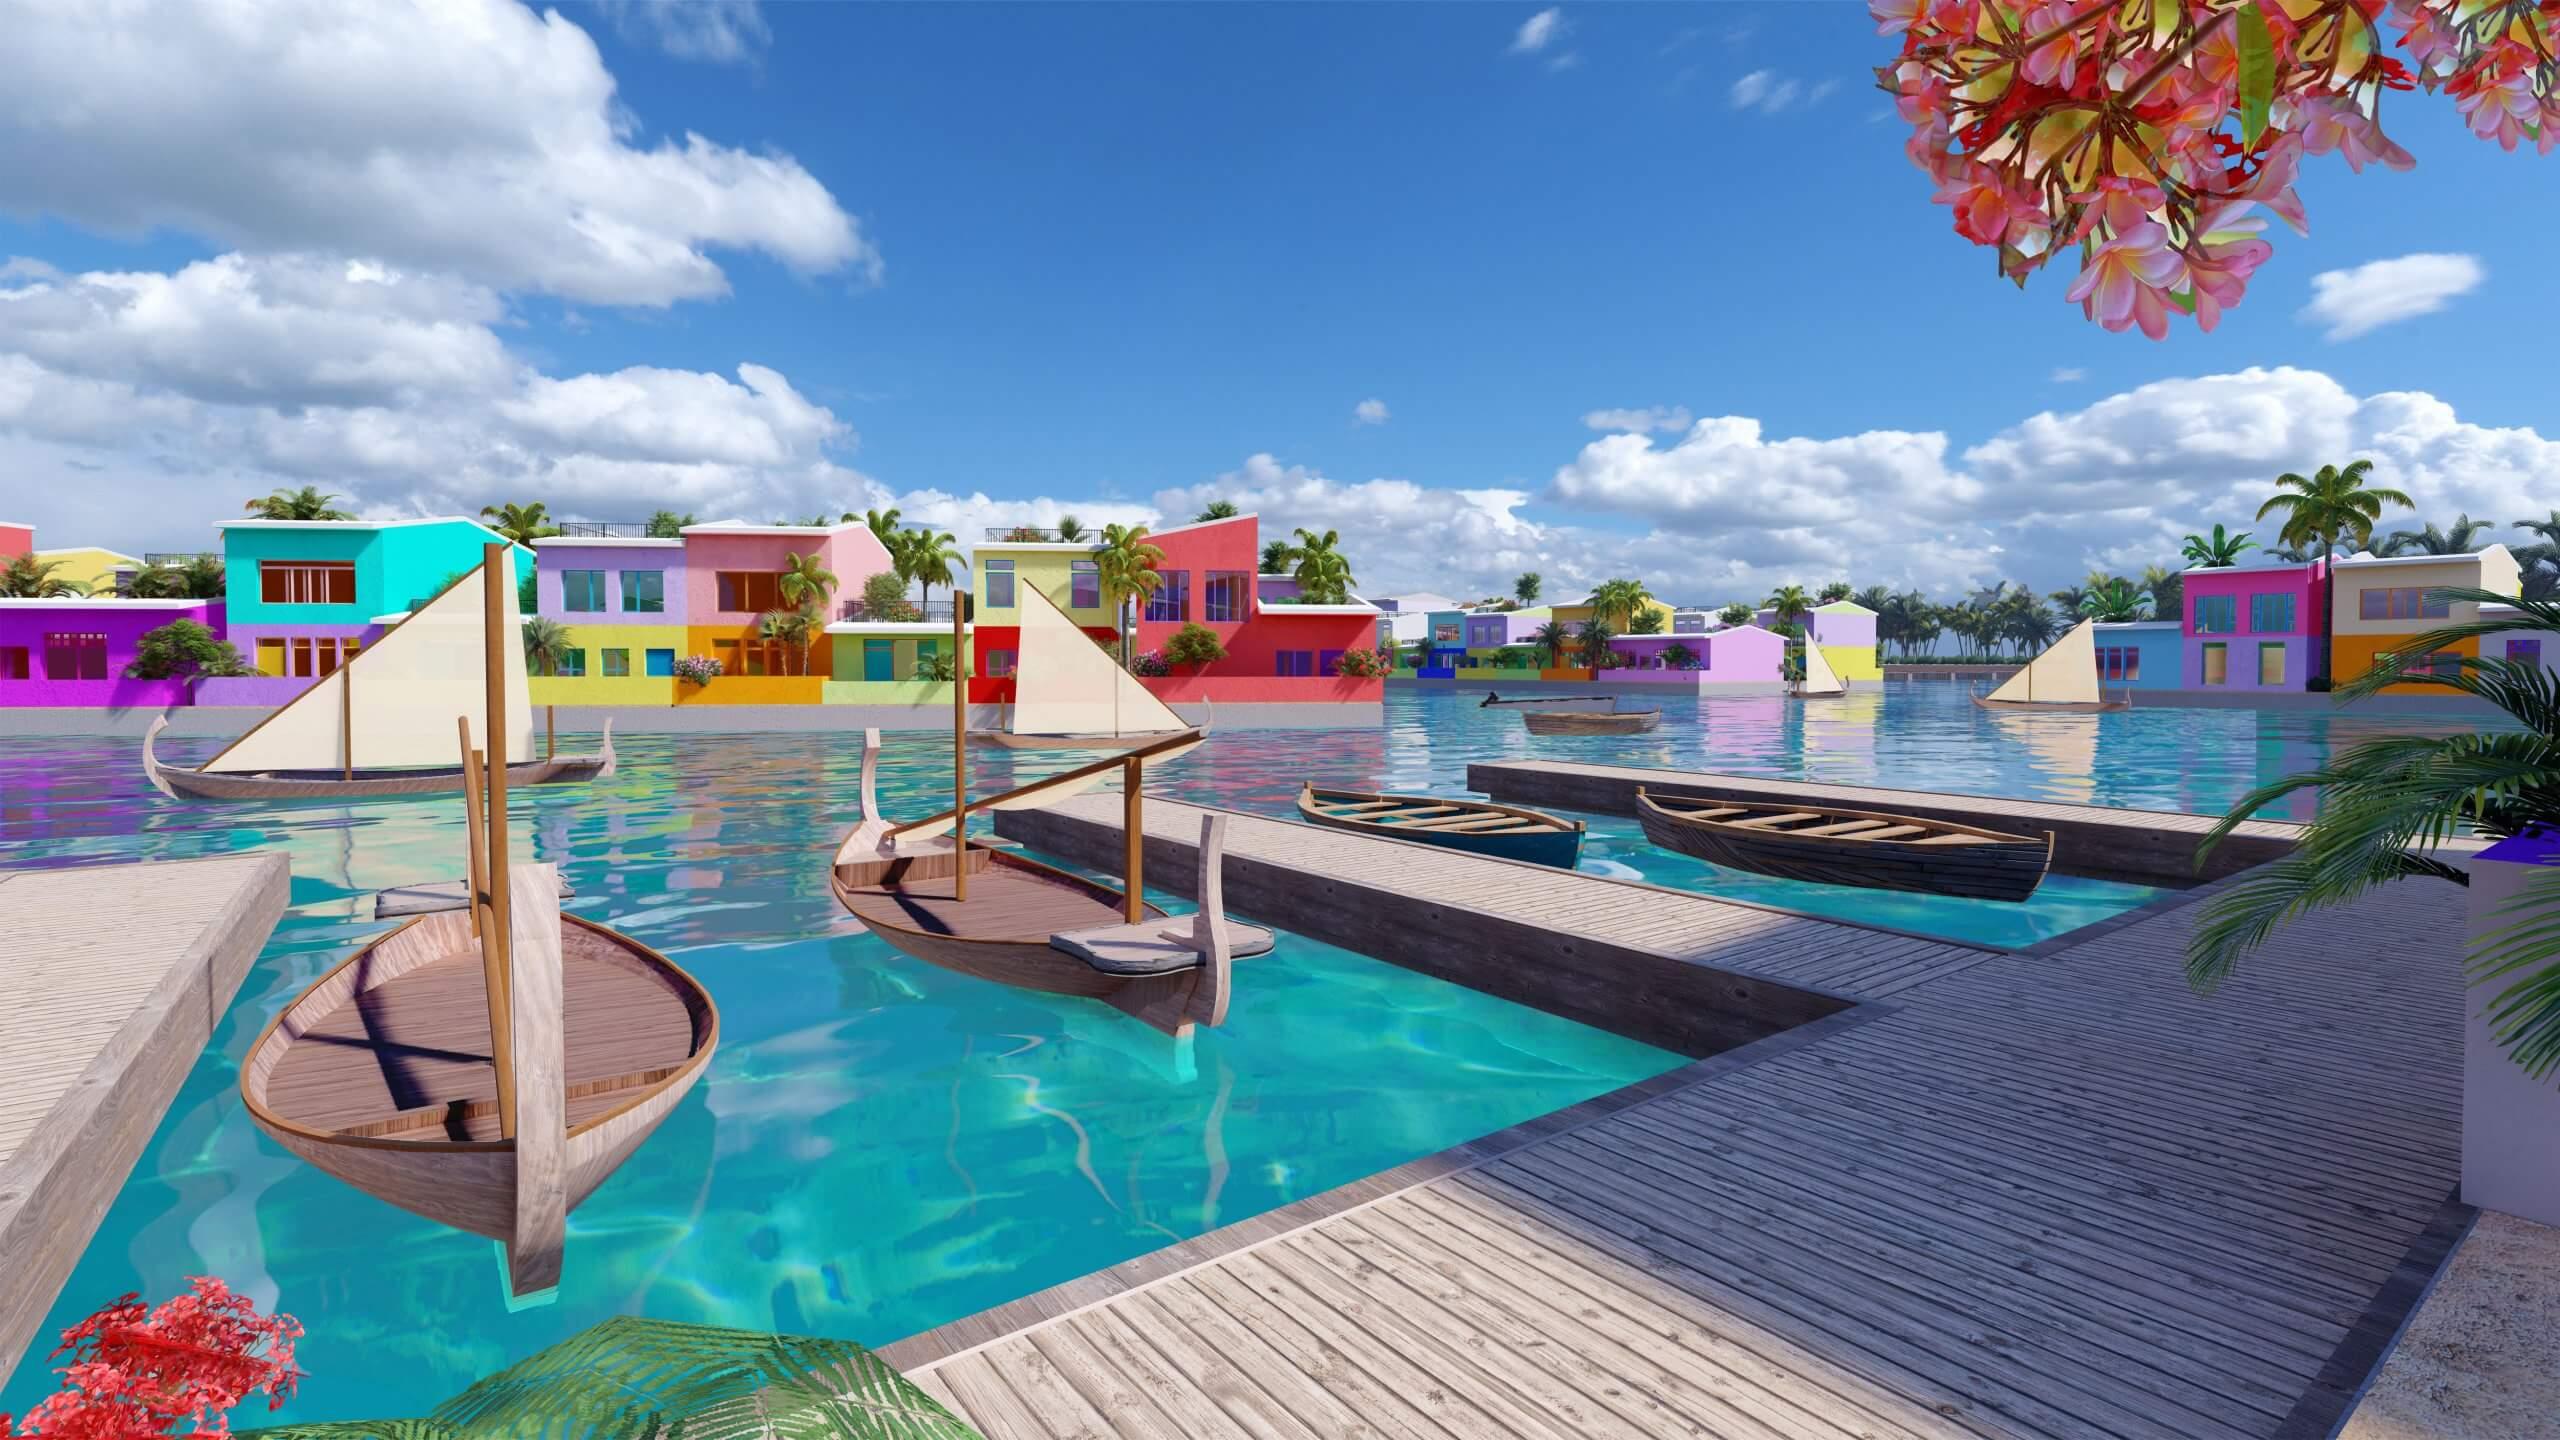 Waterstudio - Maldives Floating City